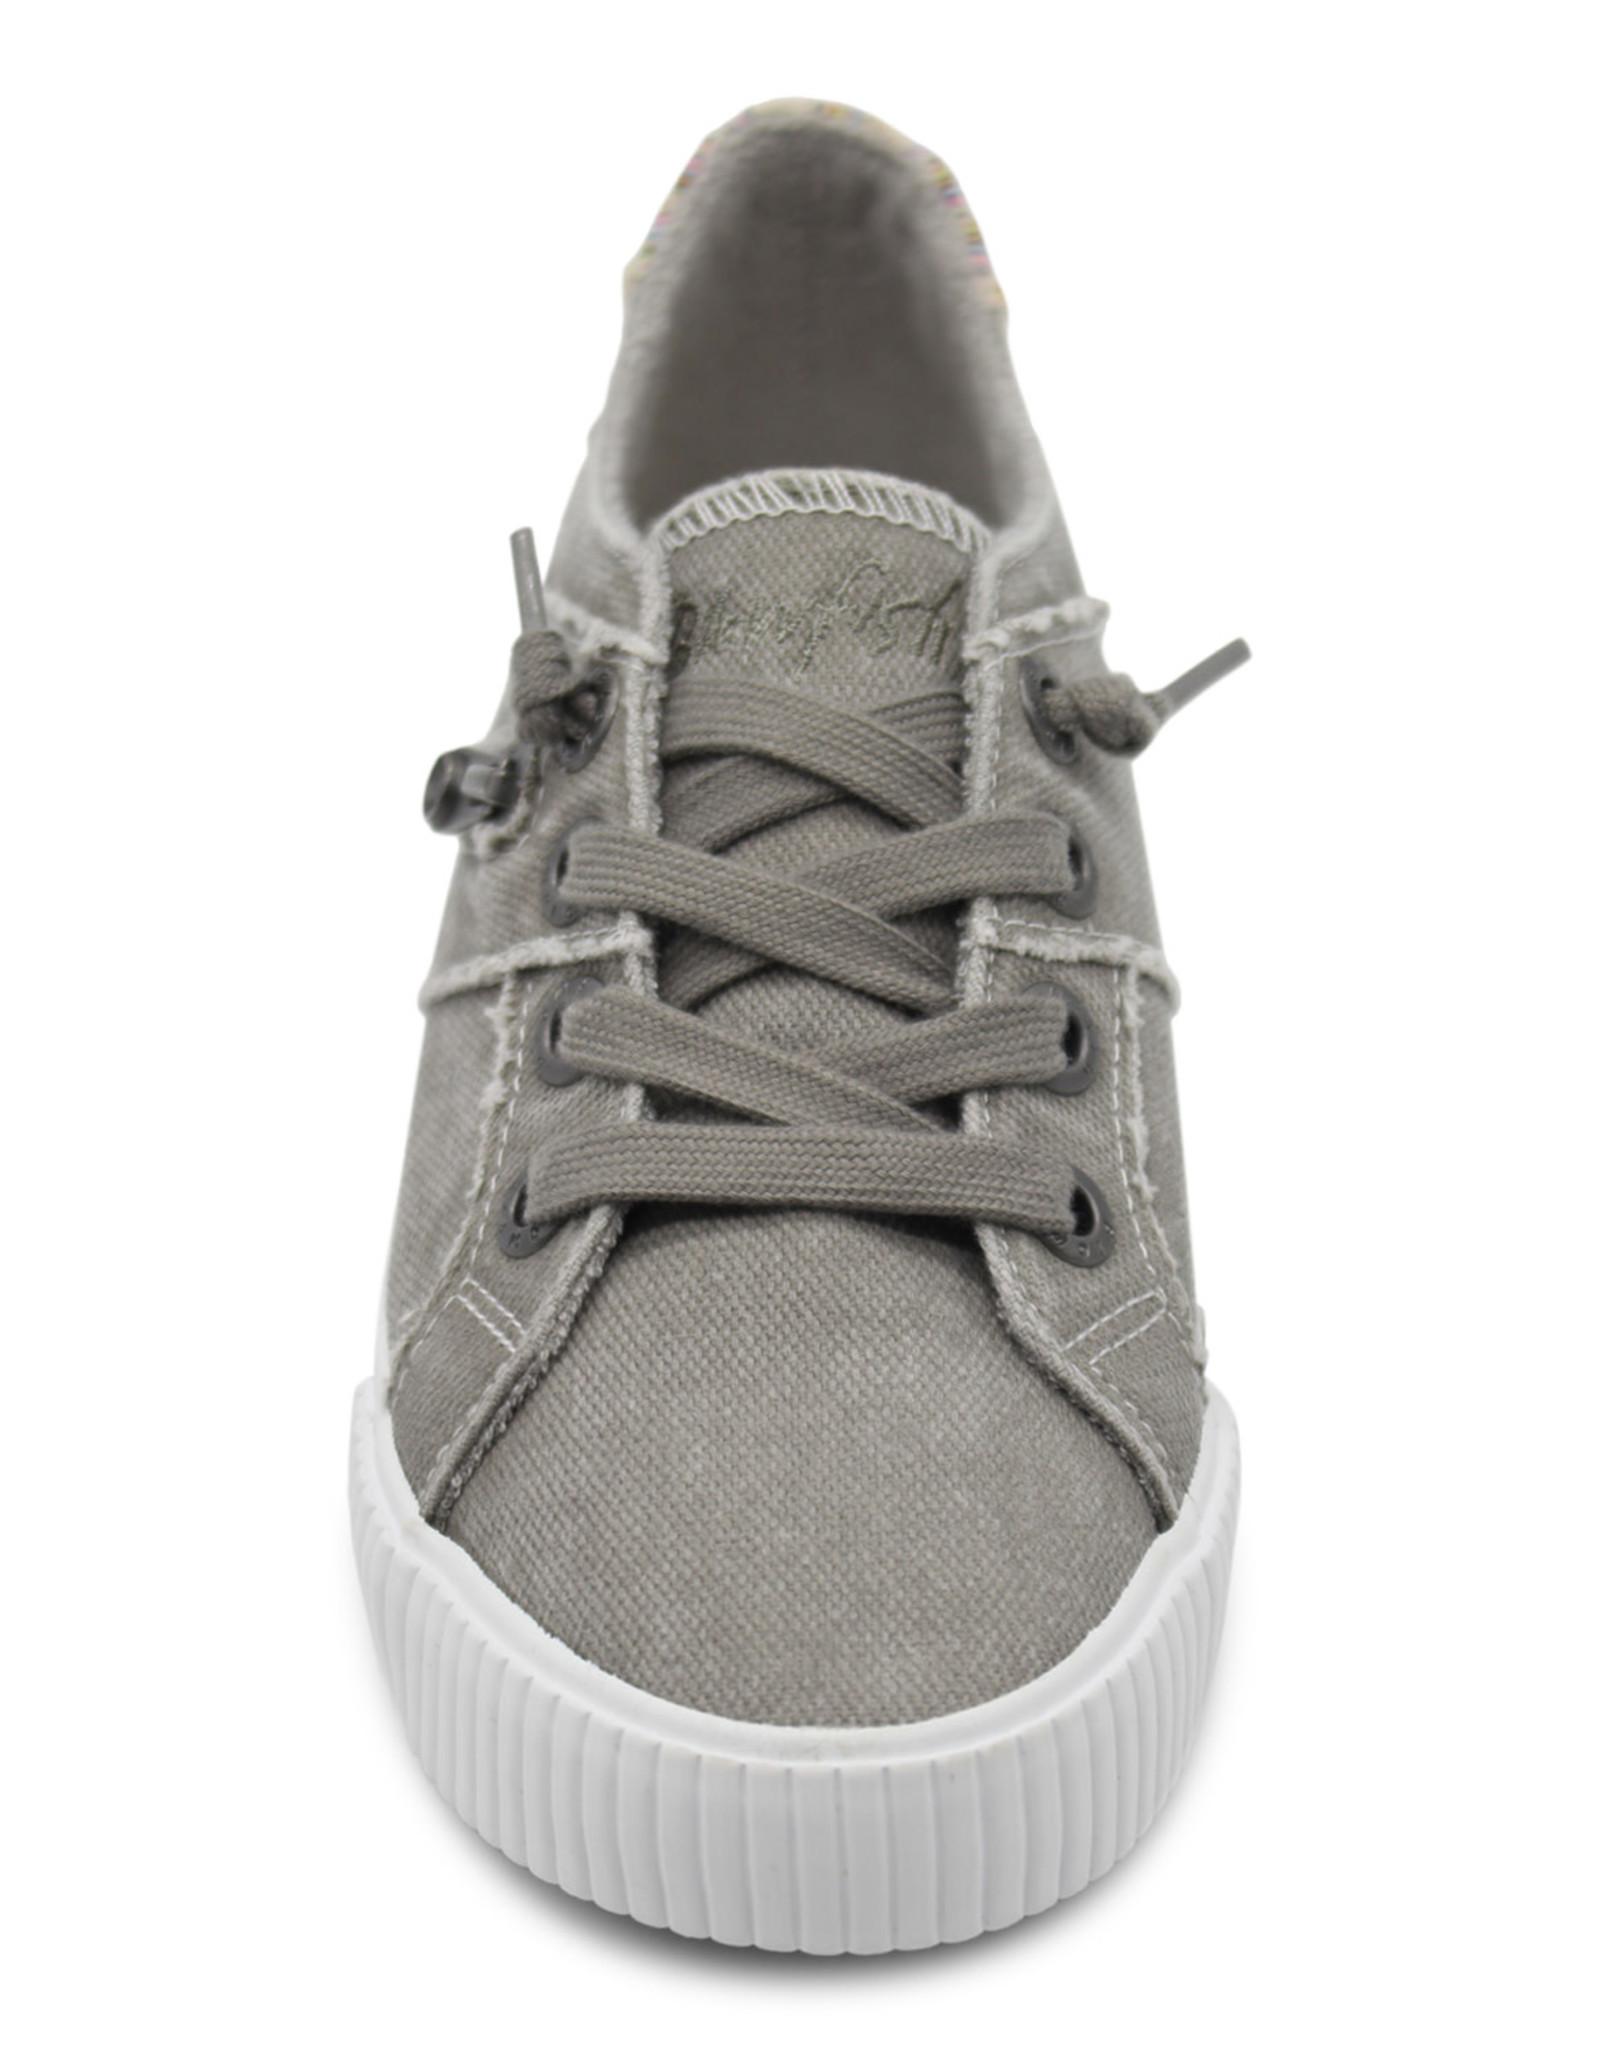 Blowfish Side Zipper Detail Grey Low-Rise Tennis Shoe